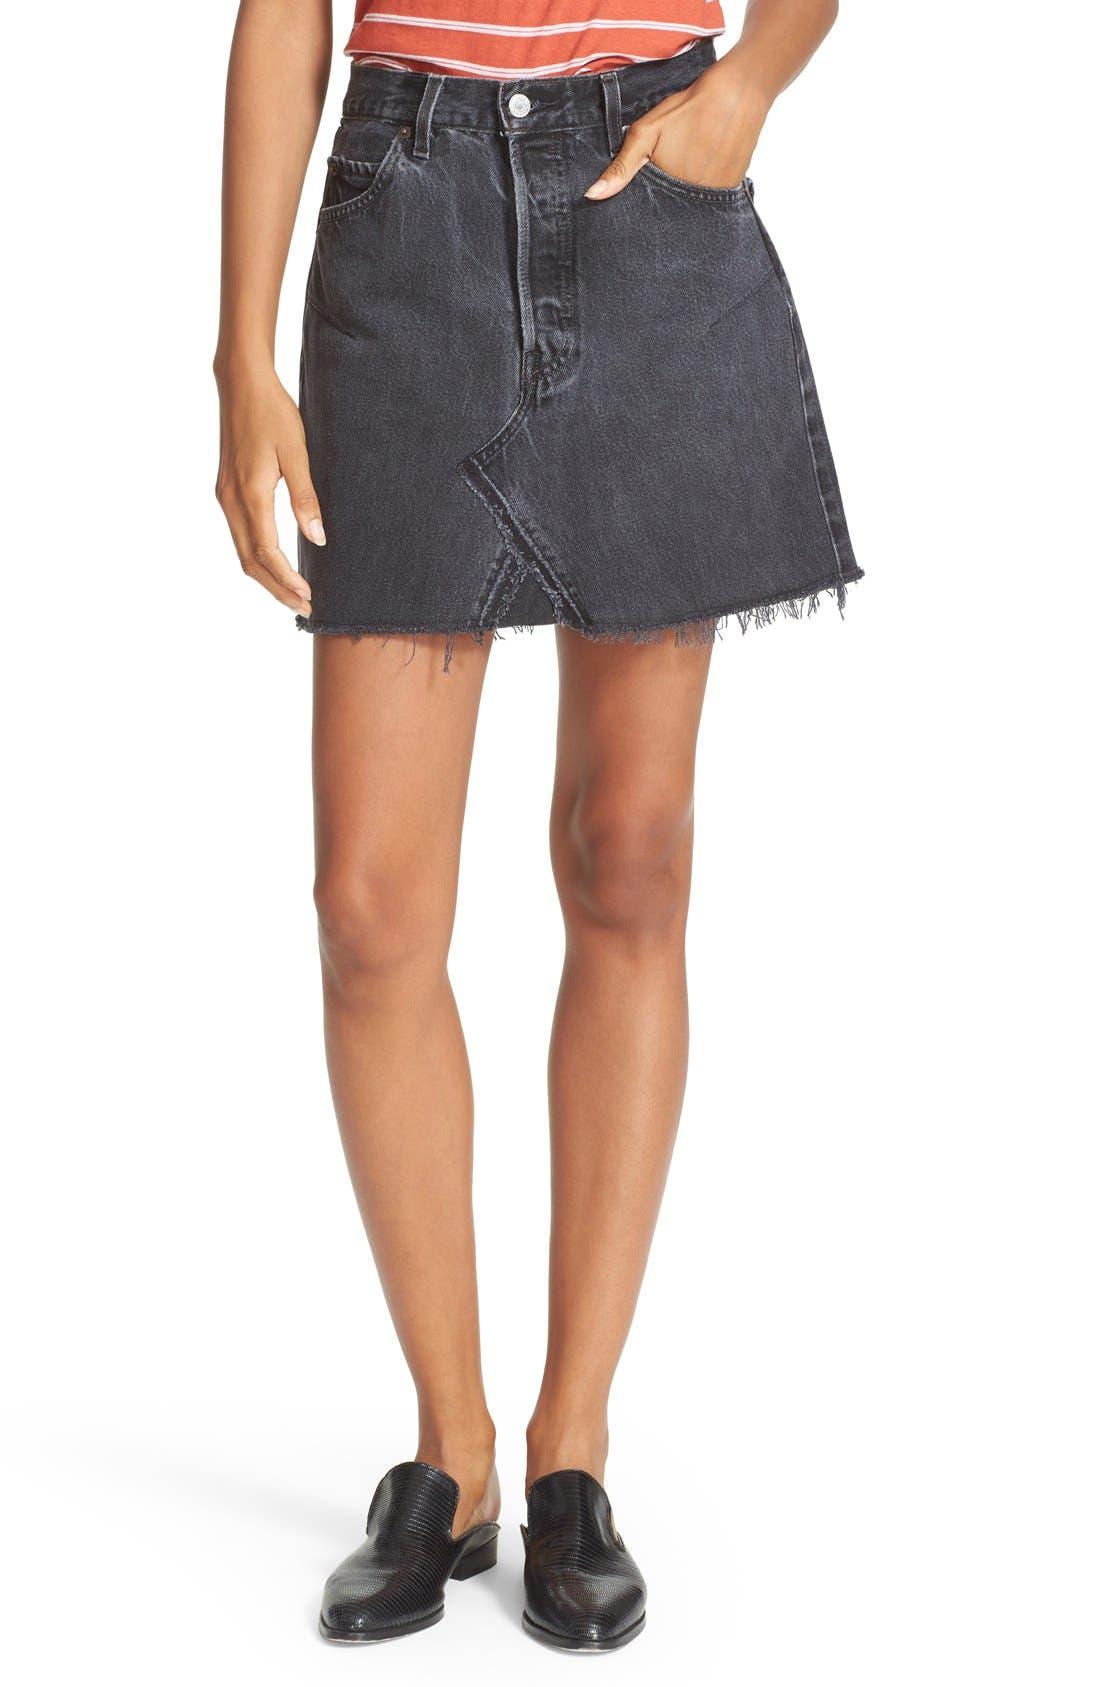 Alternate Image 1 Selected - Re/Done High Waist Repurposed Denim Miniskirt